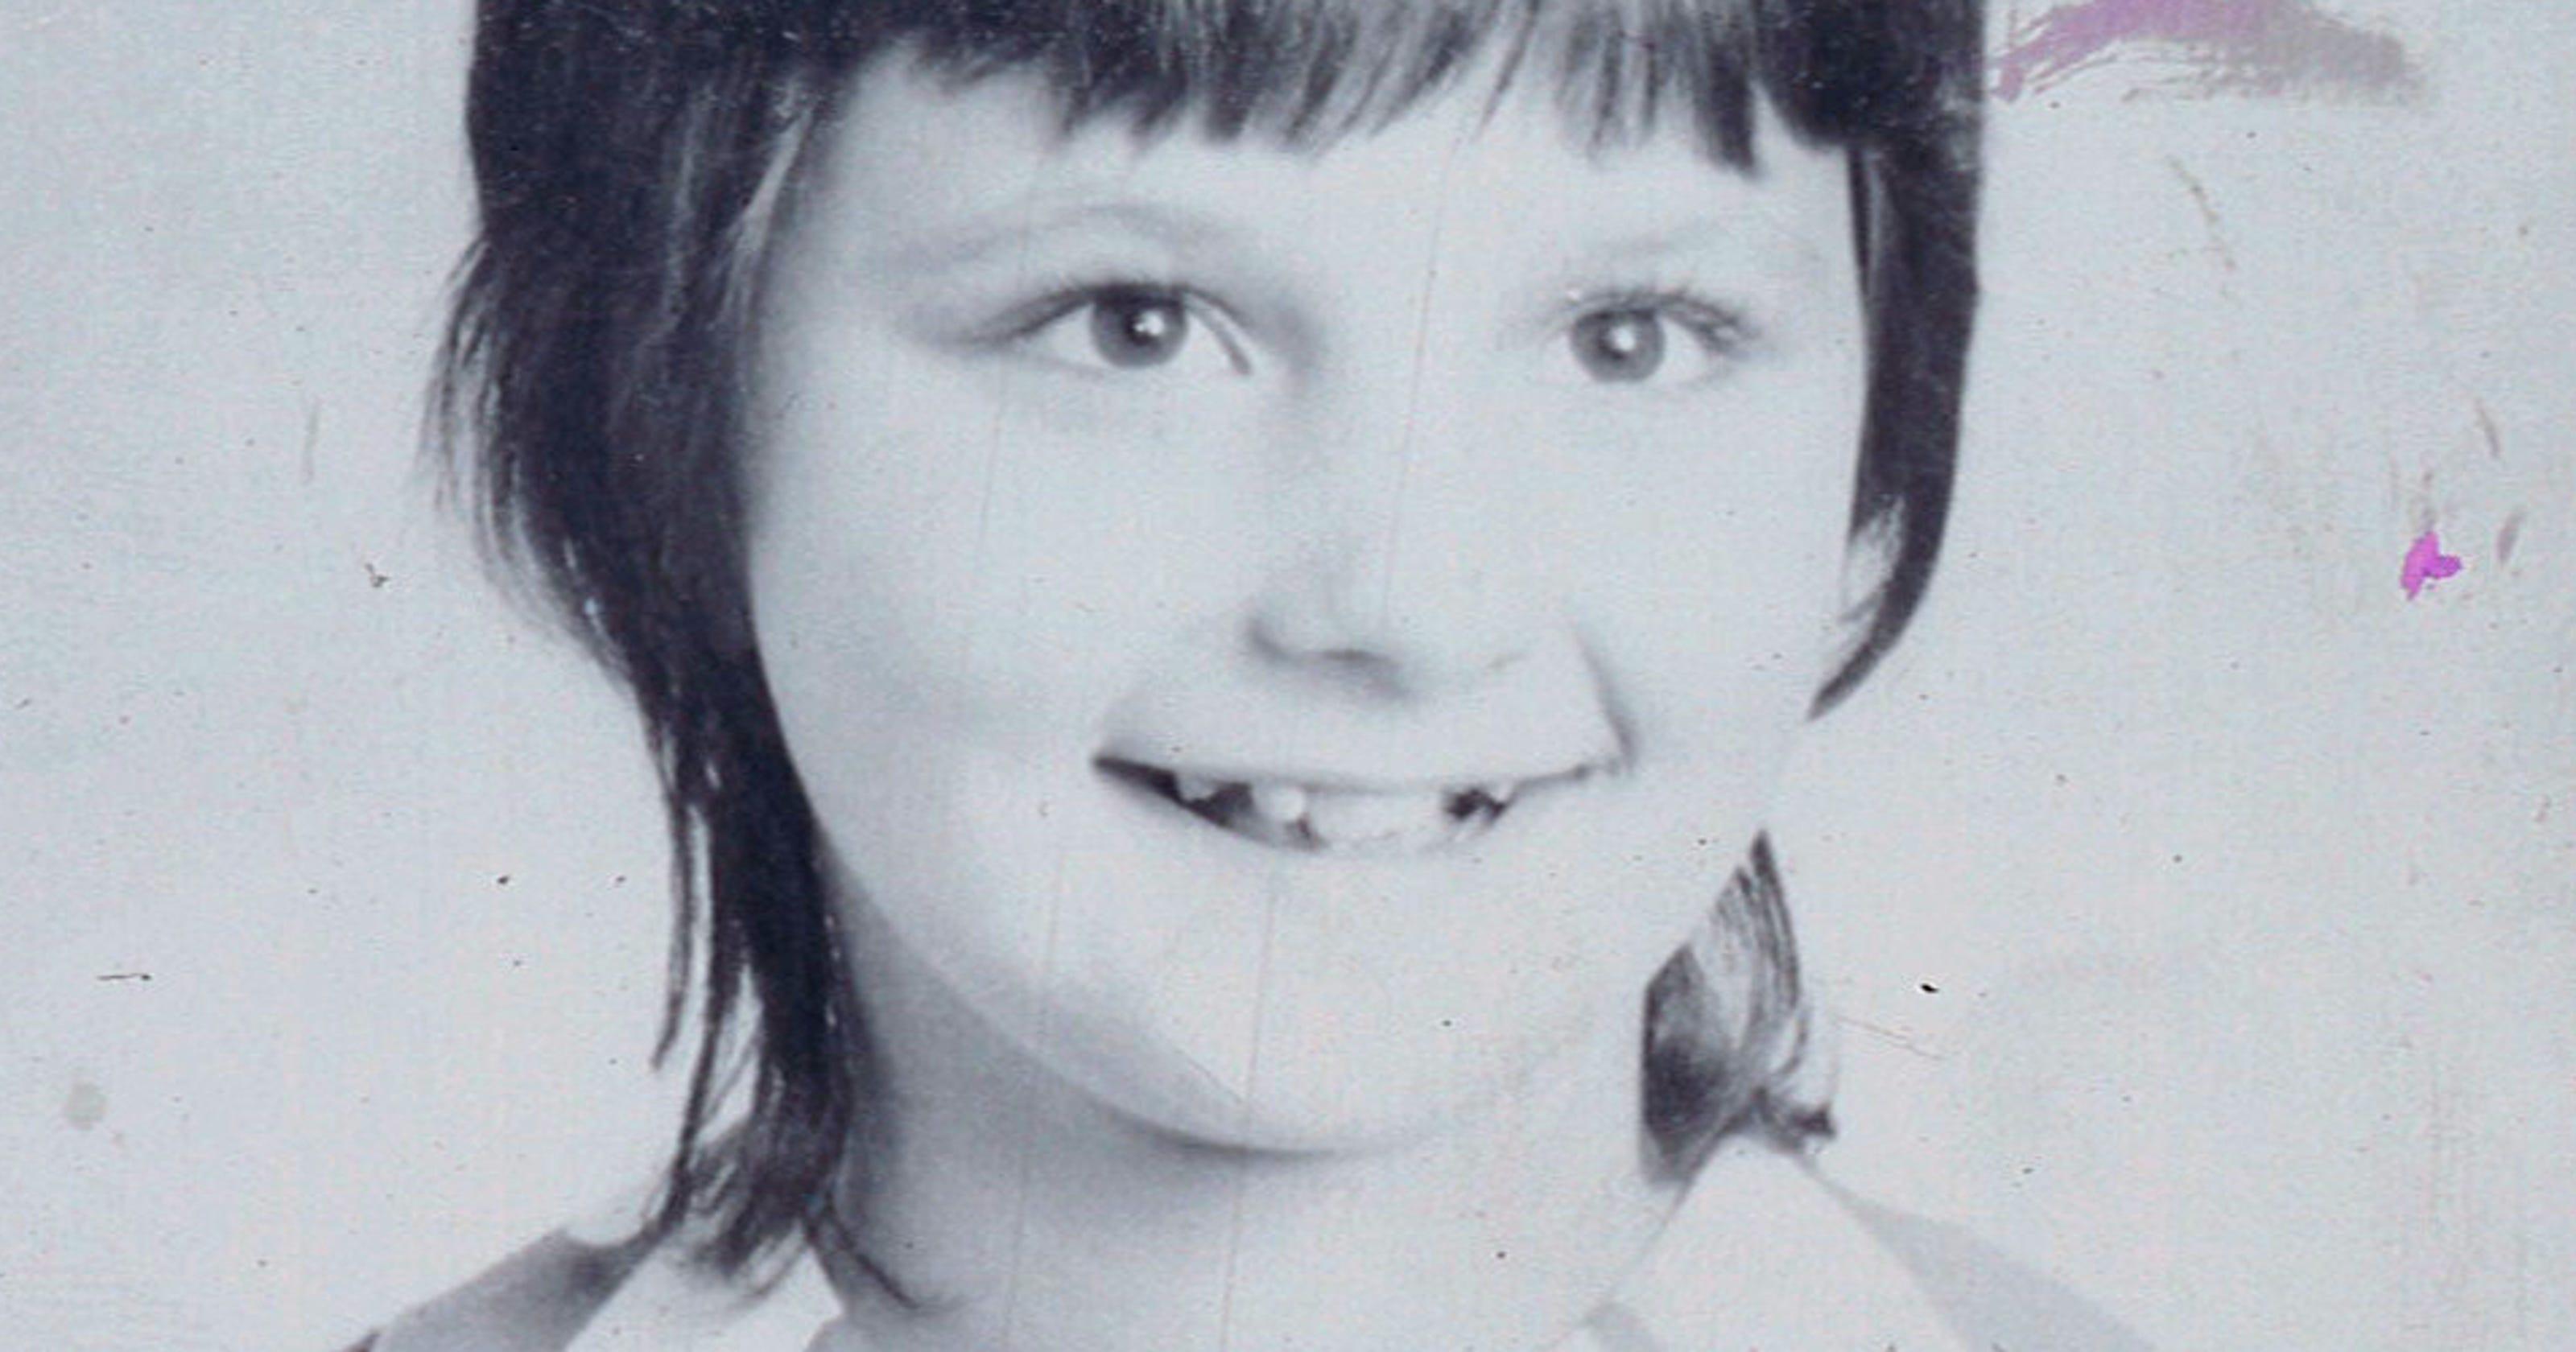 Halloween Killer Wisconsins Infamous Child Killer To Be Released